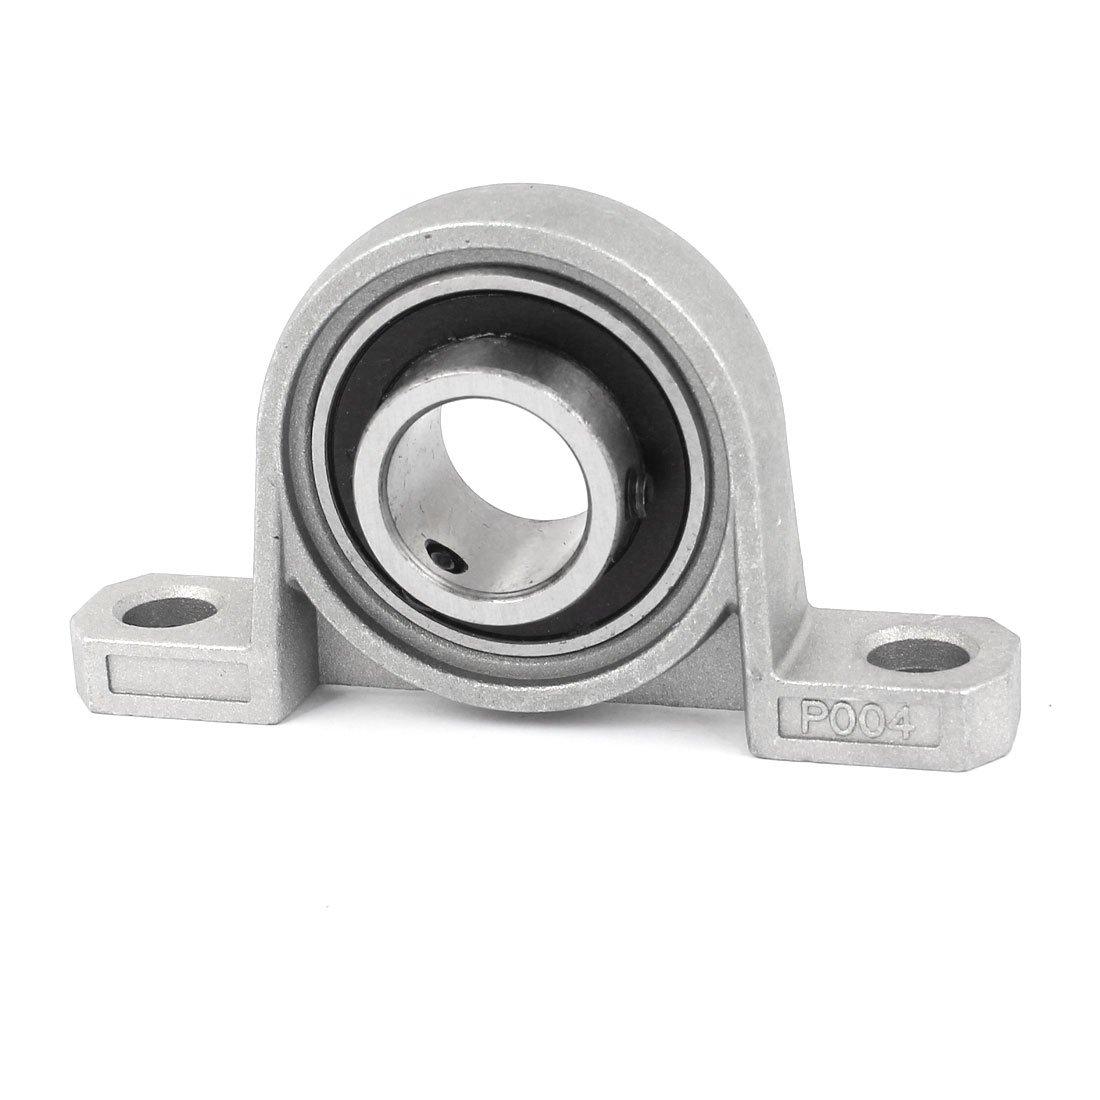 Regreasable Setscrew Locking Collar Non-Expansion Type Normal-Duty 5//8 Bore Felt Seals Sealmaster NPL-10 Pillow Block Ball Bearing 3-3//4 Bolt Hole Spacing Width Cast Iron Housing 1-1//16 Base to Center Height